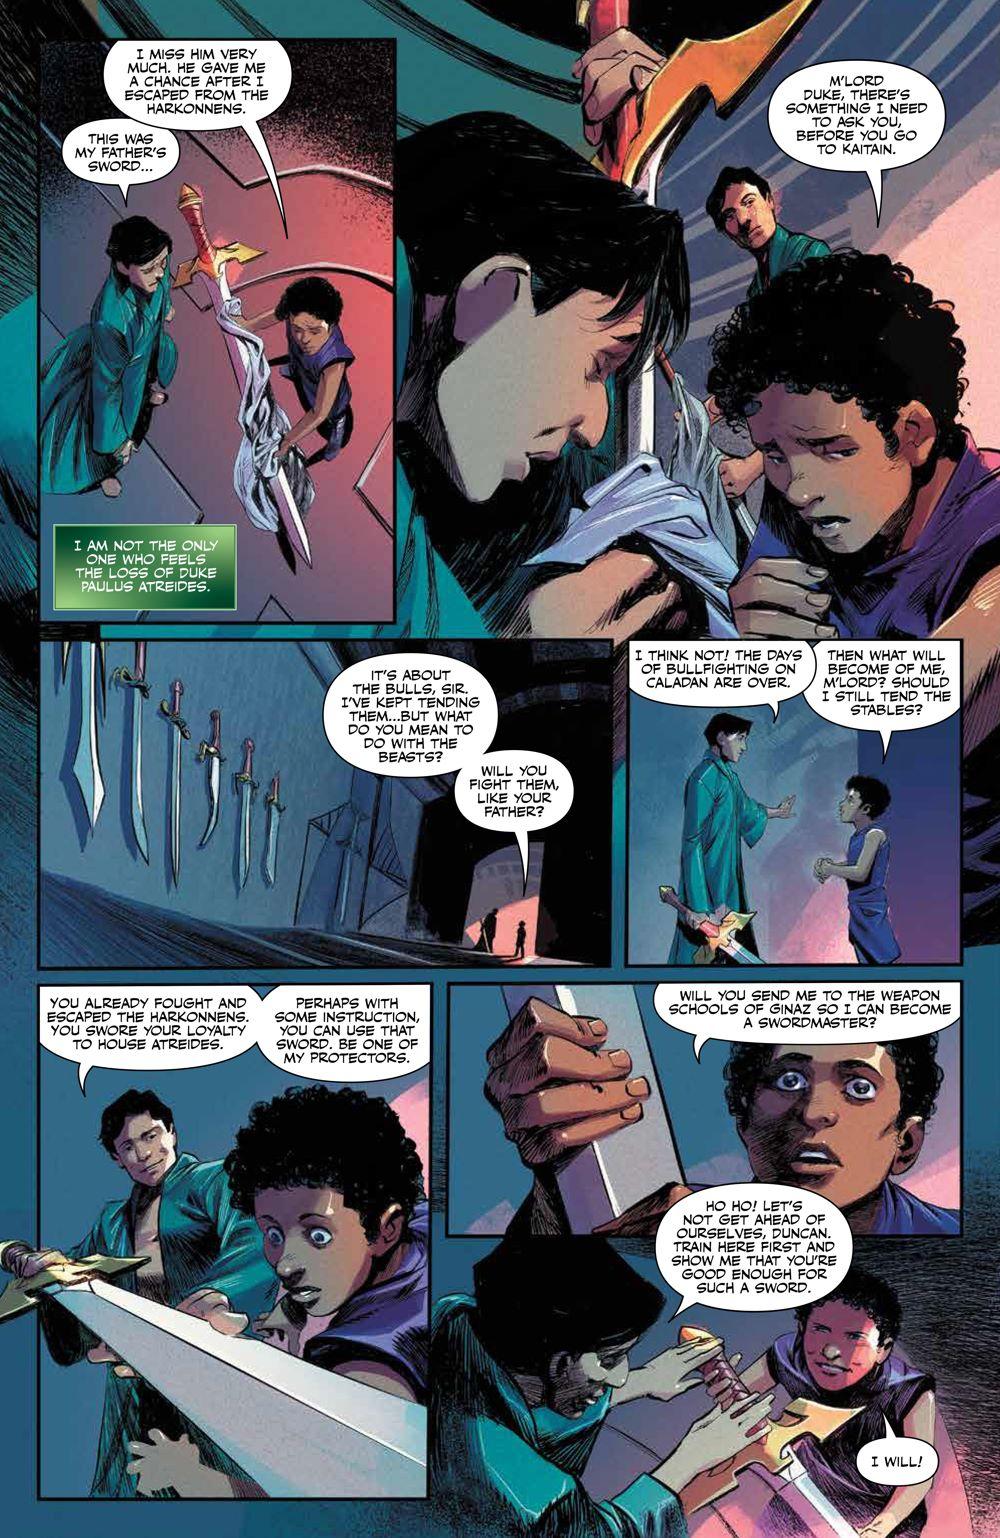 Dune_HouseAtreides_010_PRESS_6 ComicList Previews: DUNE HOUSE ATREIDES #10 (OF 12)